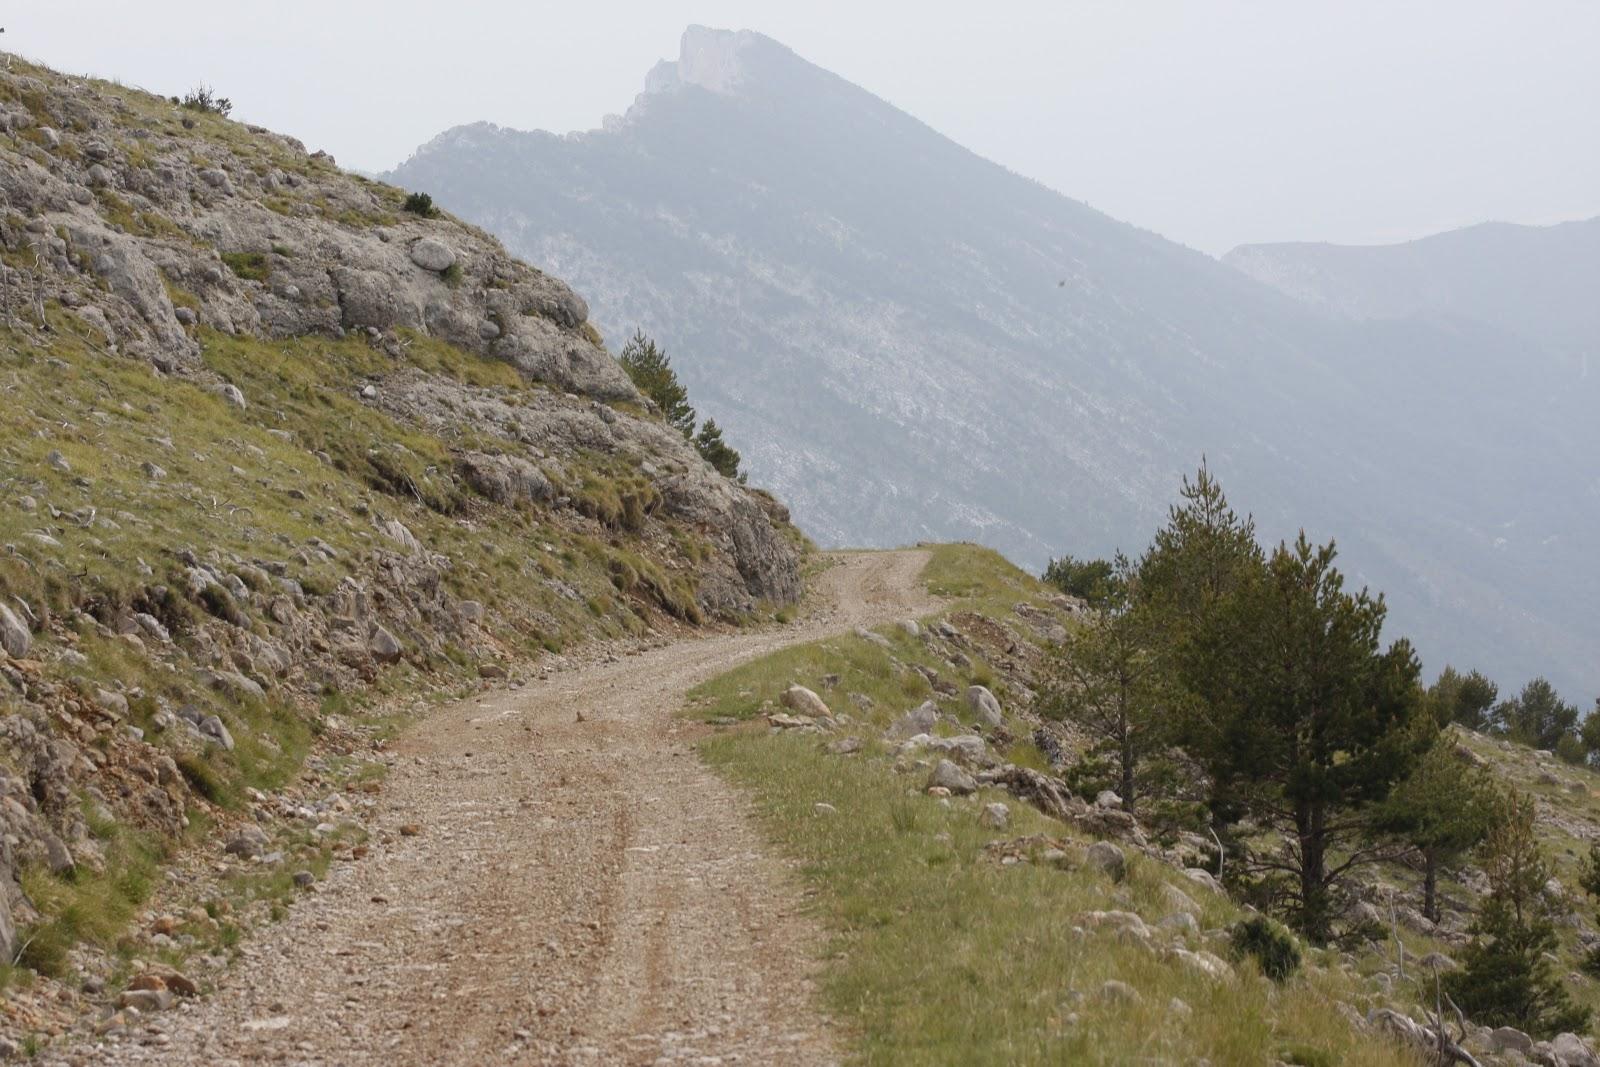 Birding lleida expedicions blog de viajes abril 2012 for La serra progetta le planimetrie